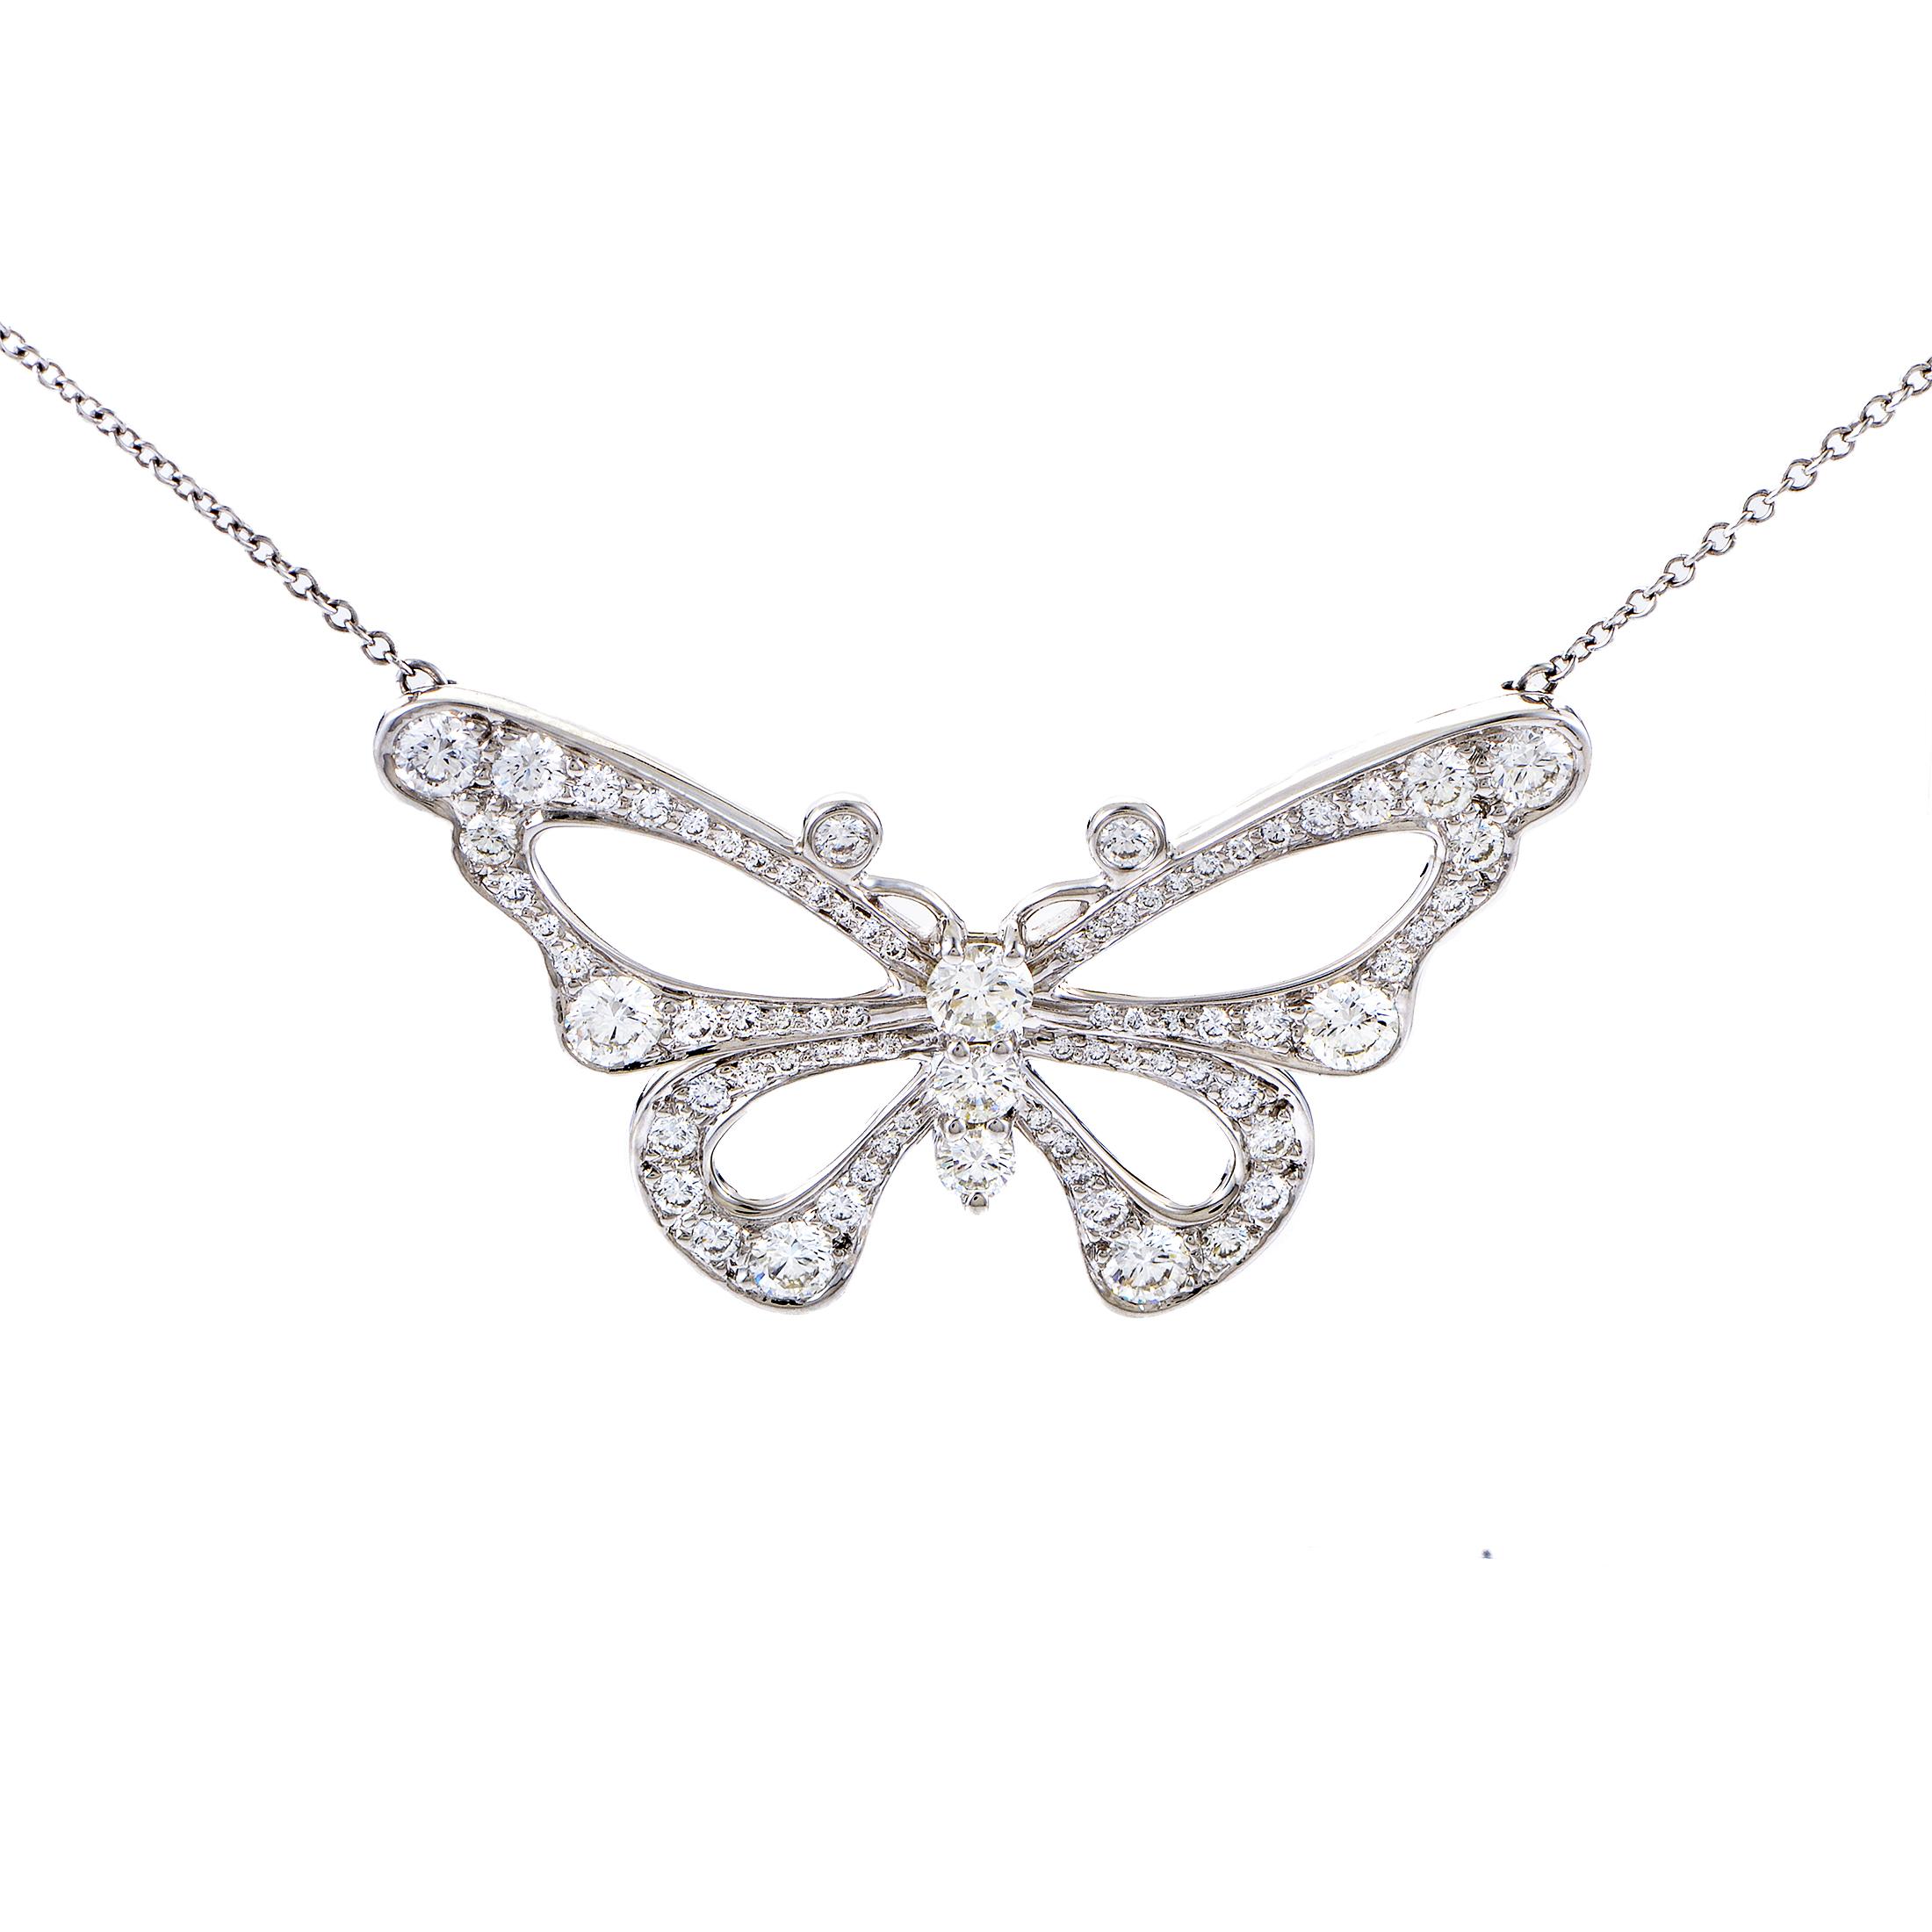 Tiffany & Co. Enchant Women's Platinum & Diamond Butterfly Pendant Necklace